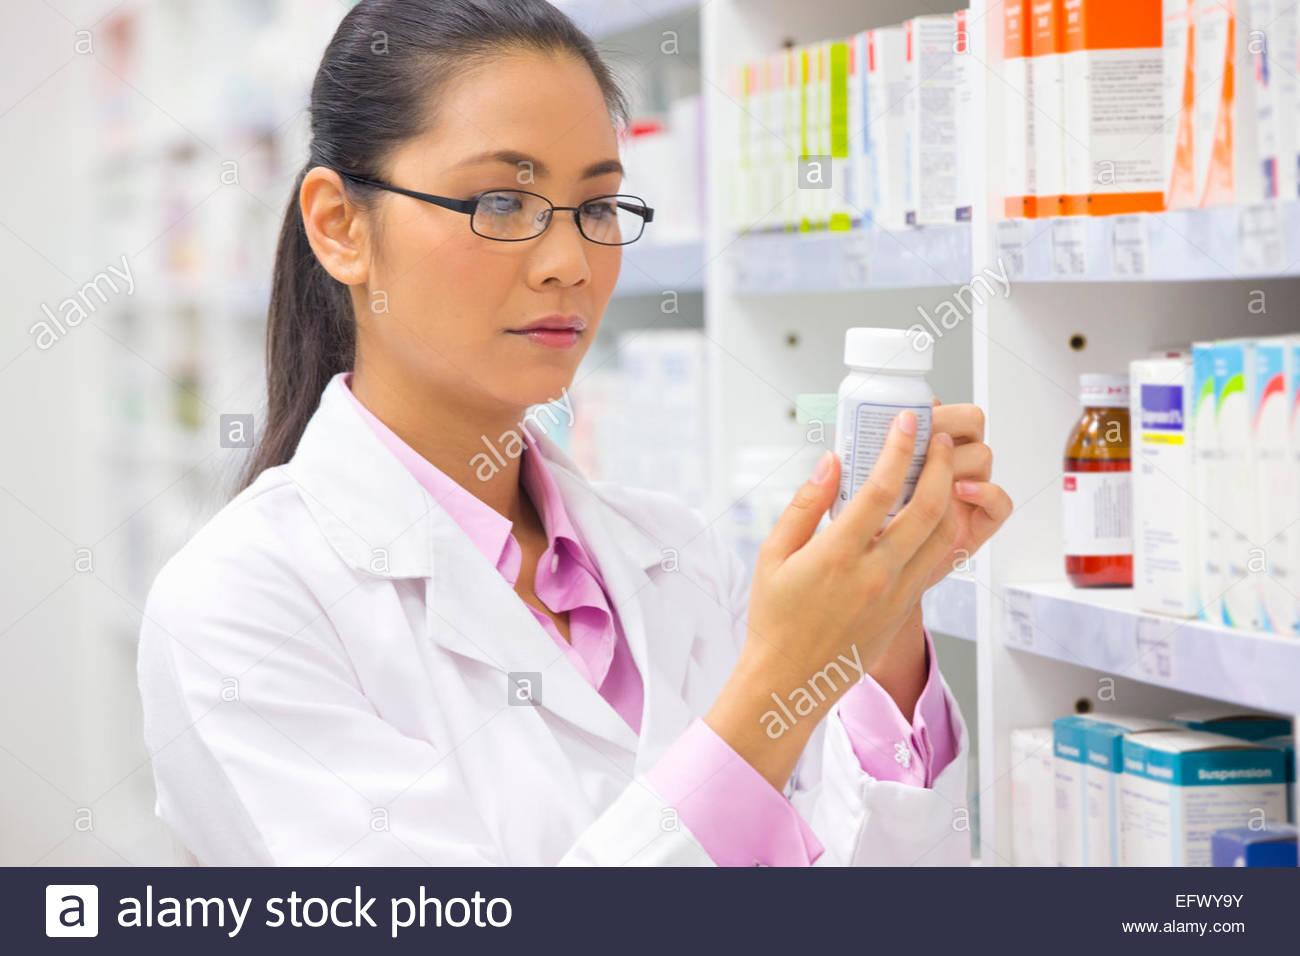 Pharmacist, reading medication pot from pharmacy shelf - Stock Image